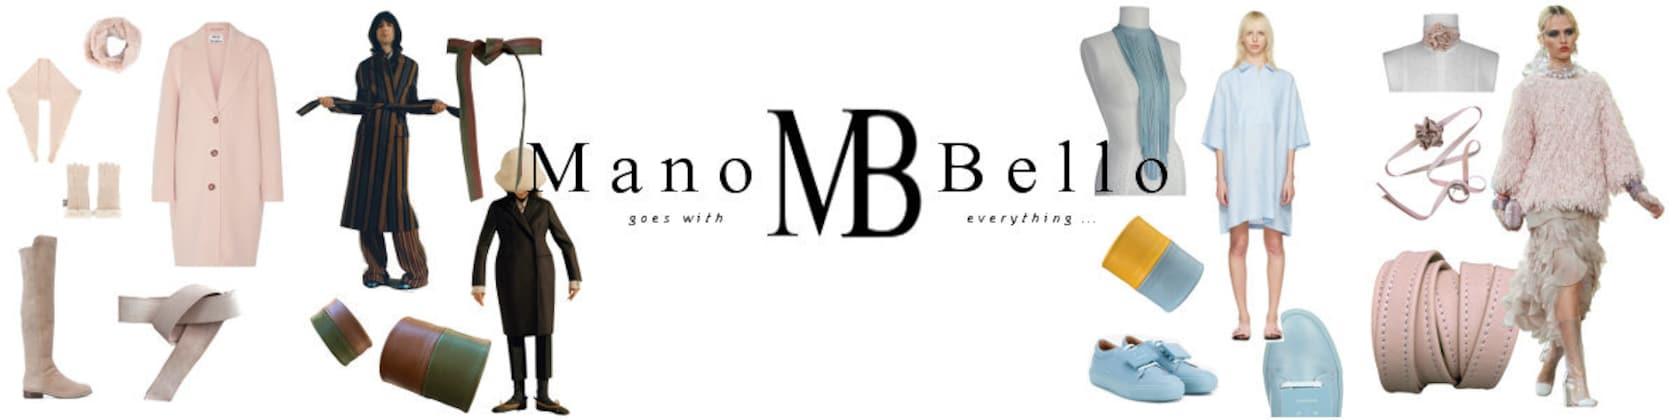 ManoBello leather belts & bags etc. go with by ManoBello on Etsy